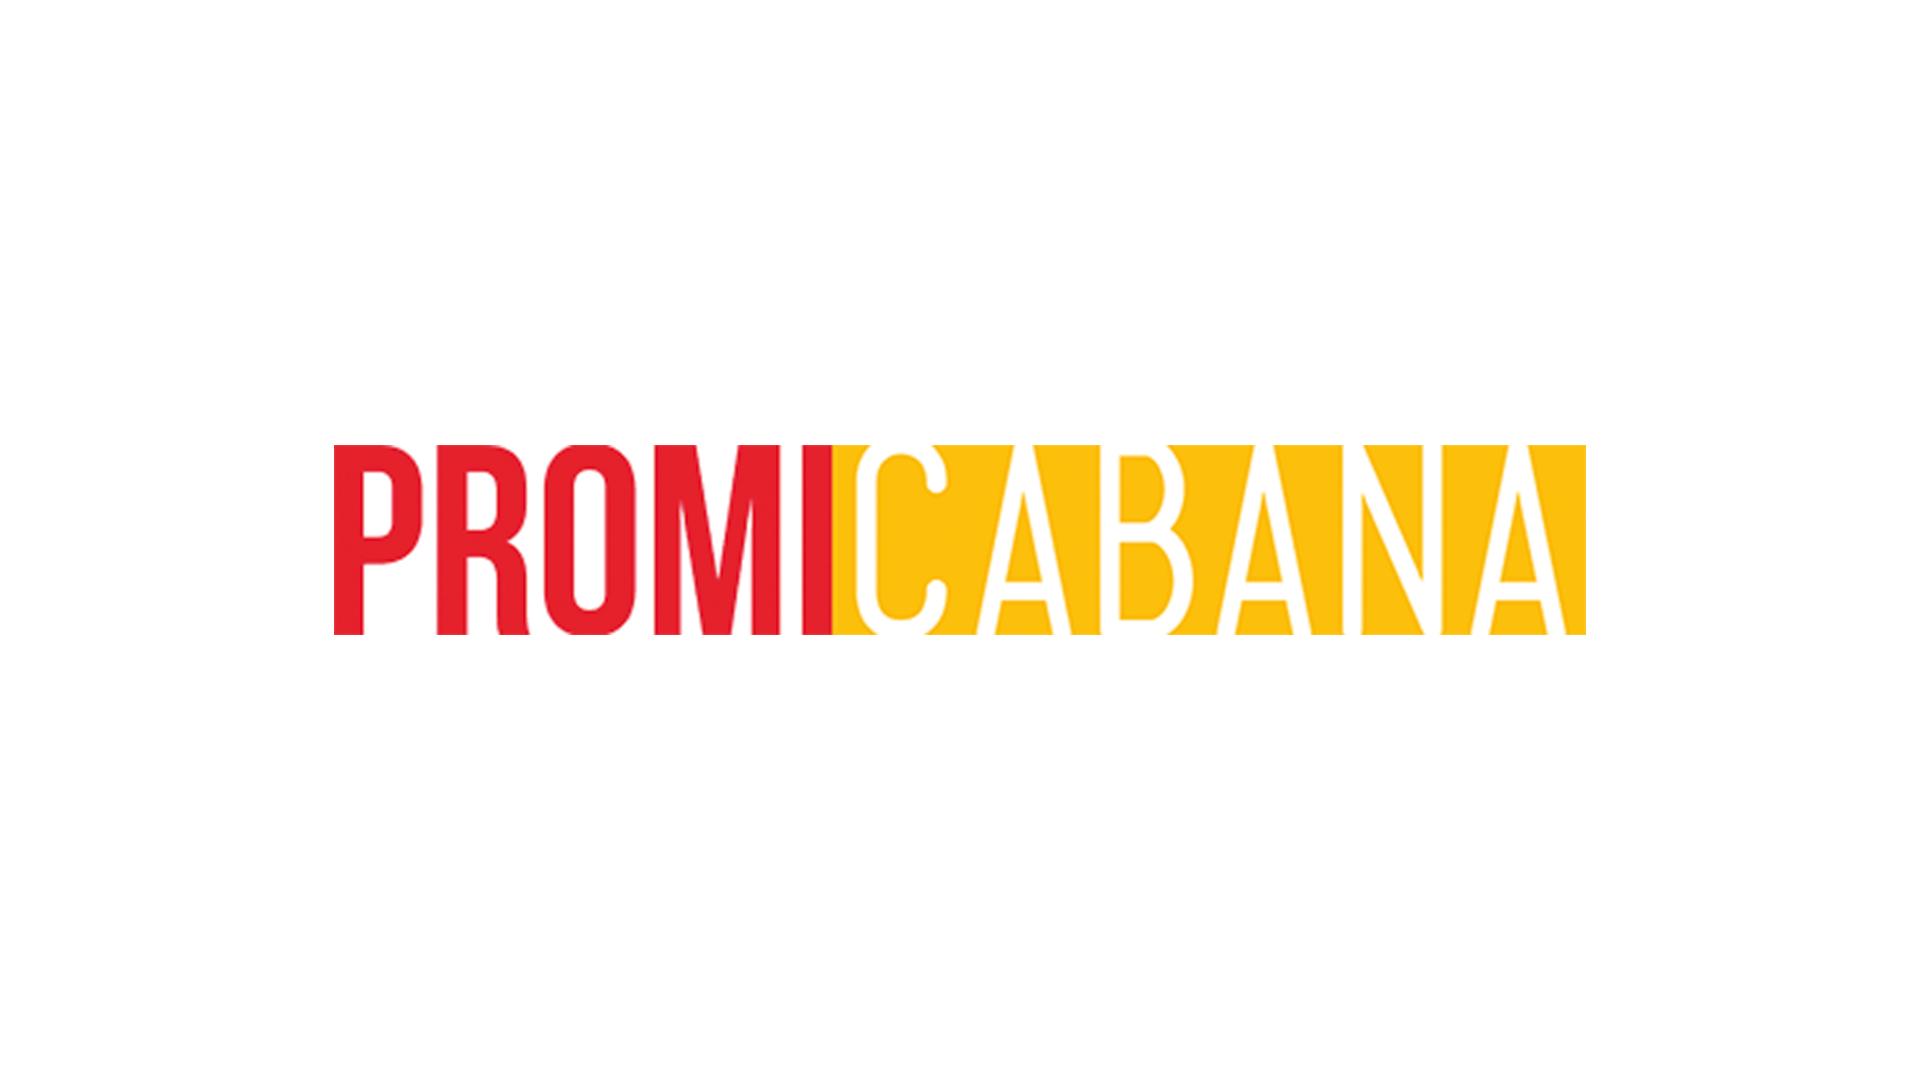 Bruce-Willis-David-Letterman-Haare